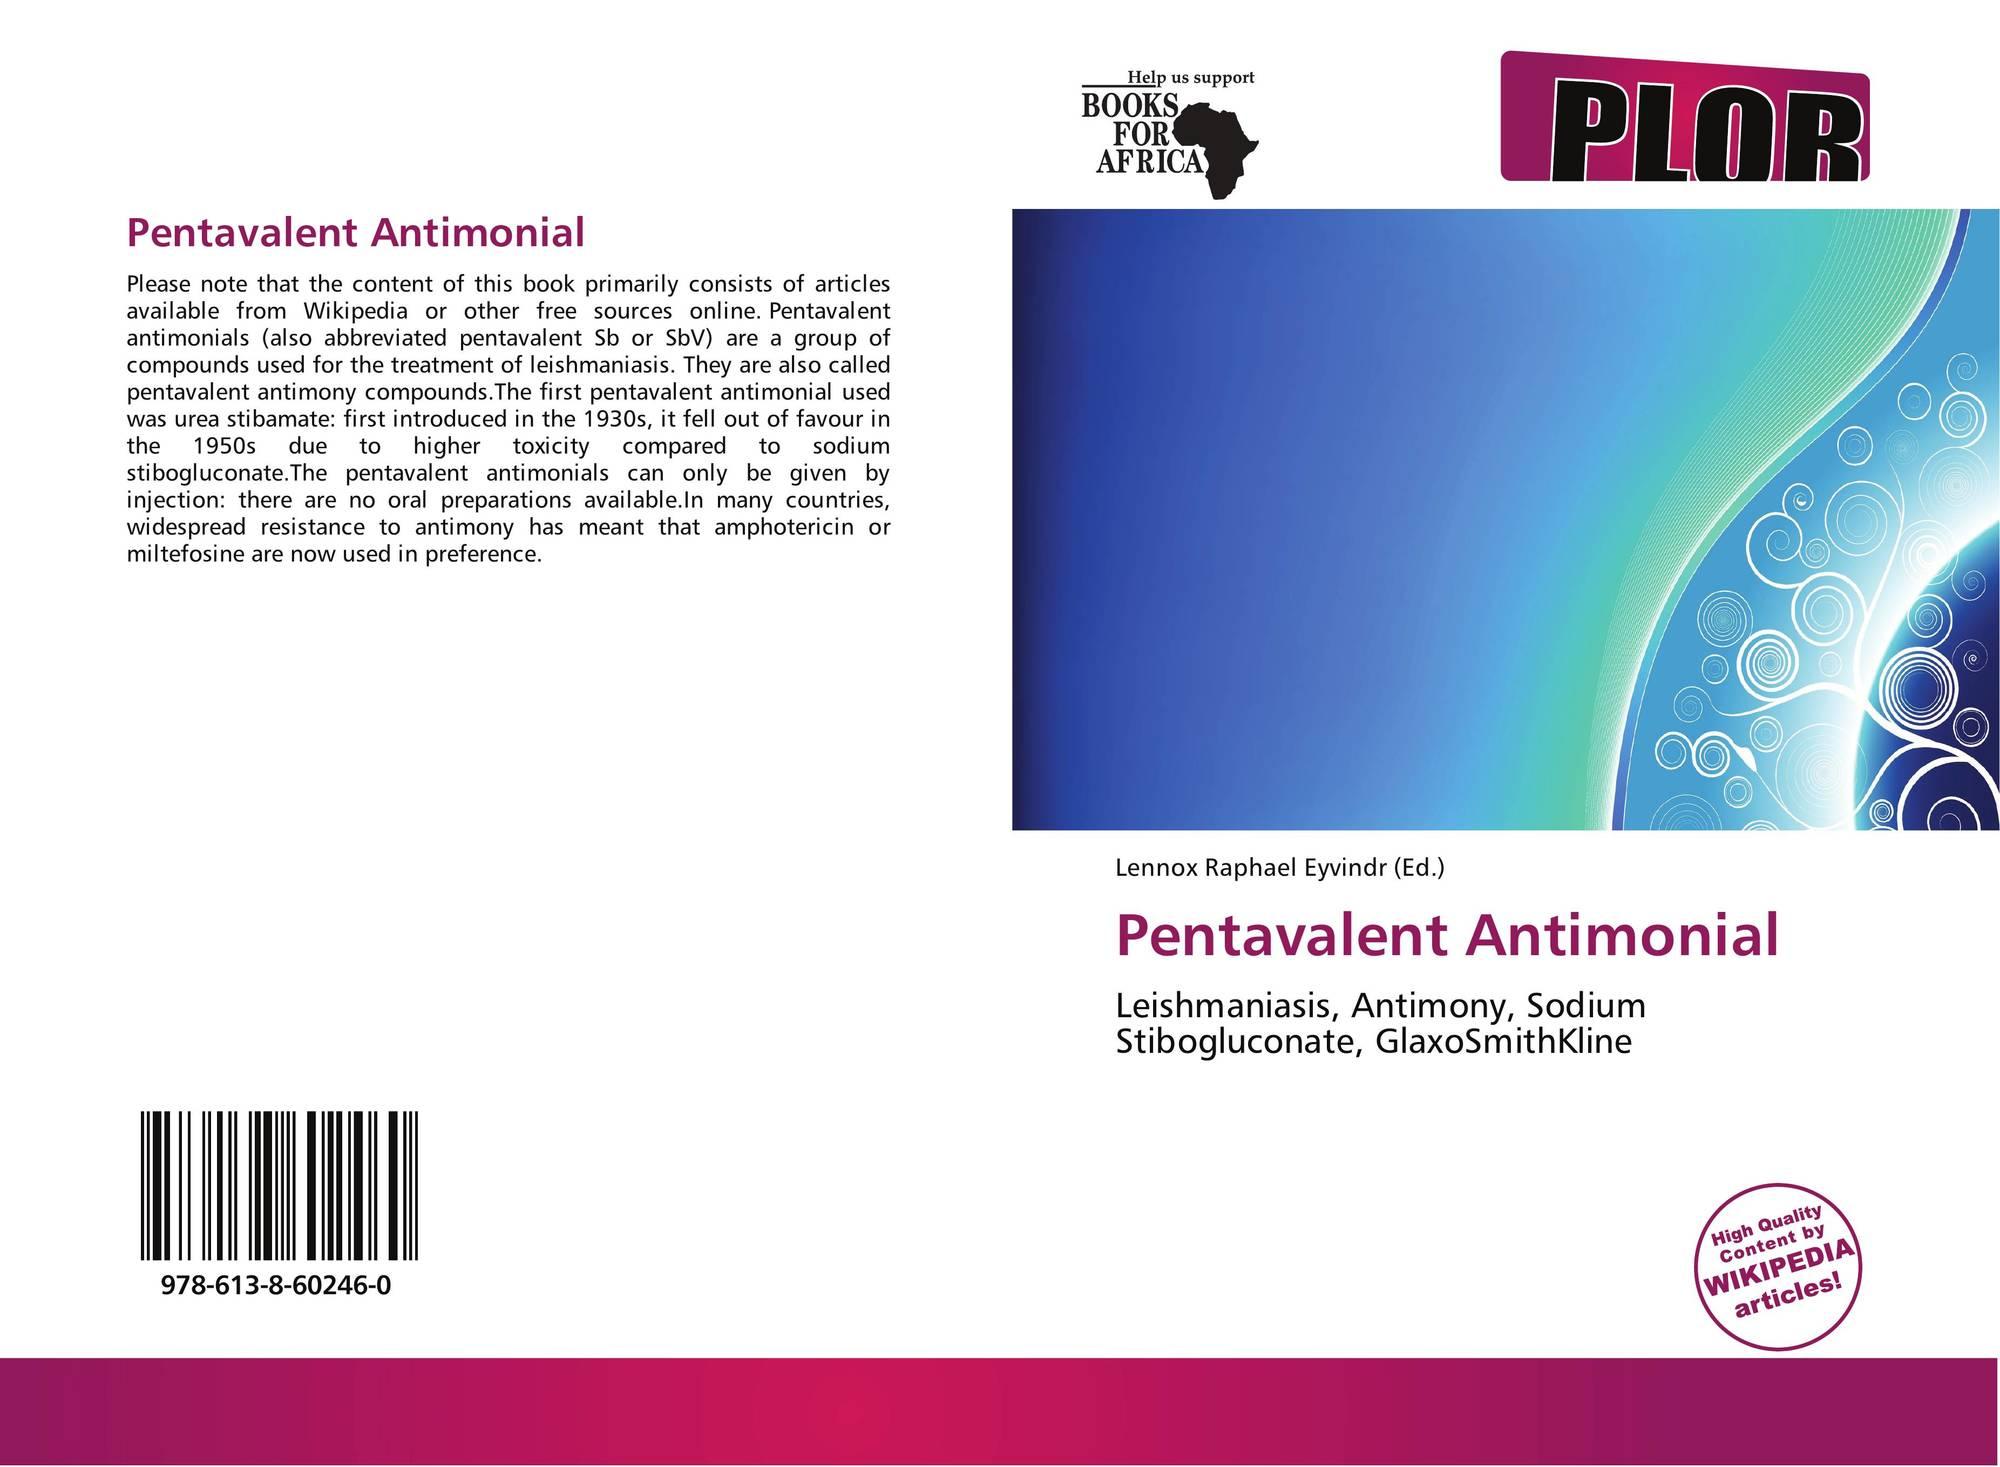 Pentavalent Antimonial, 978-613-8-60246-0, 6138602463